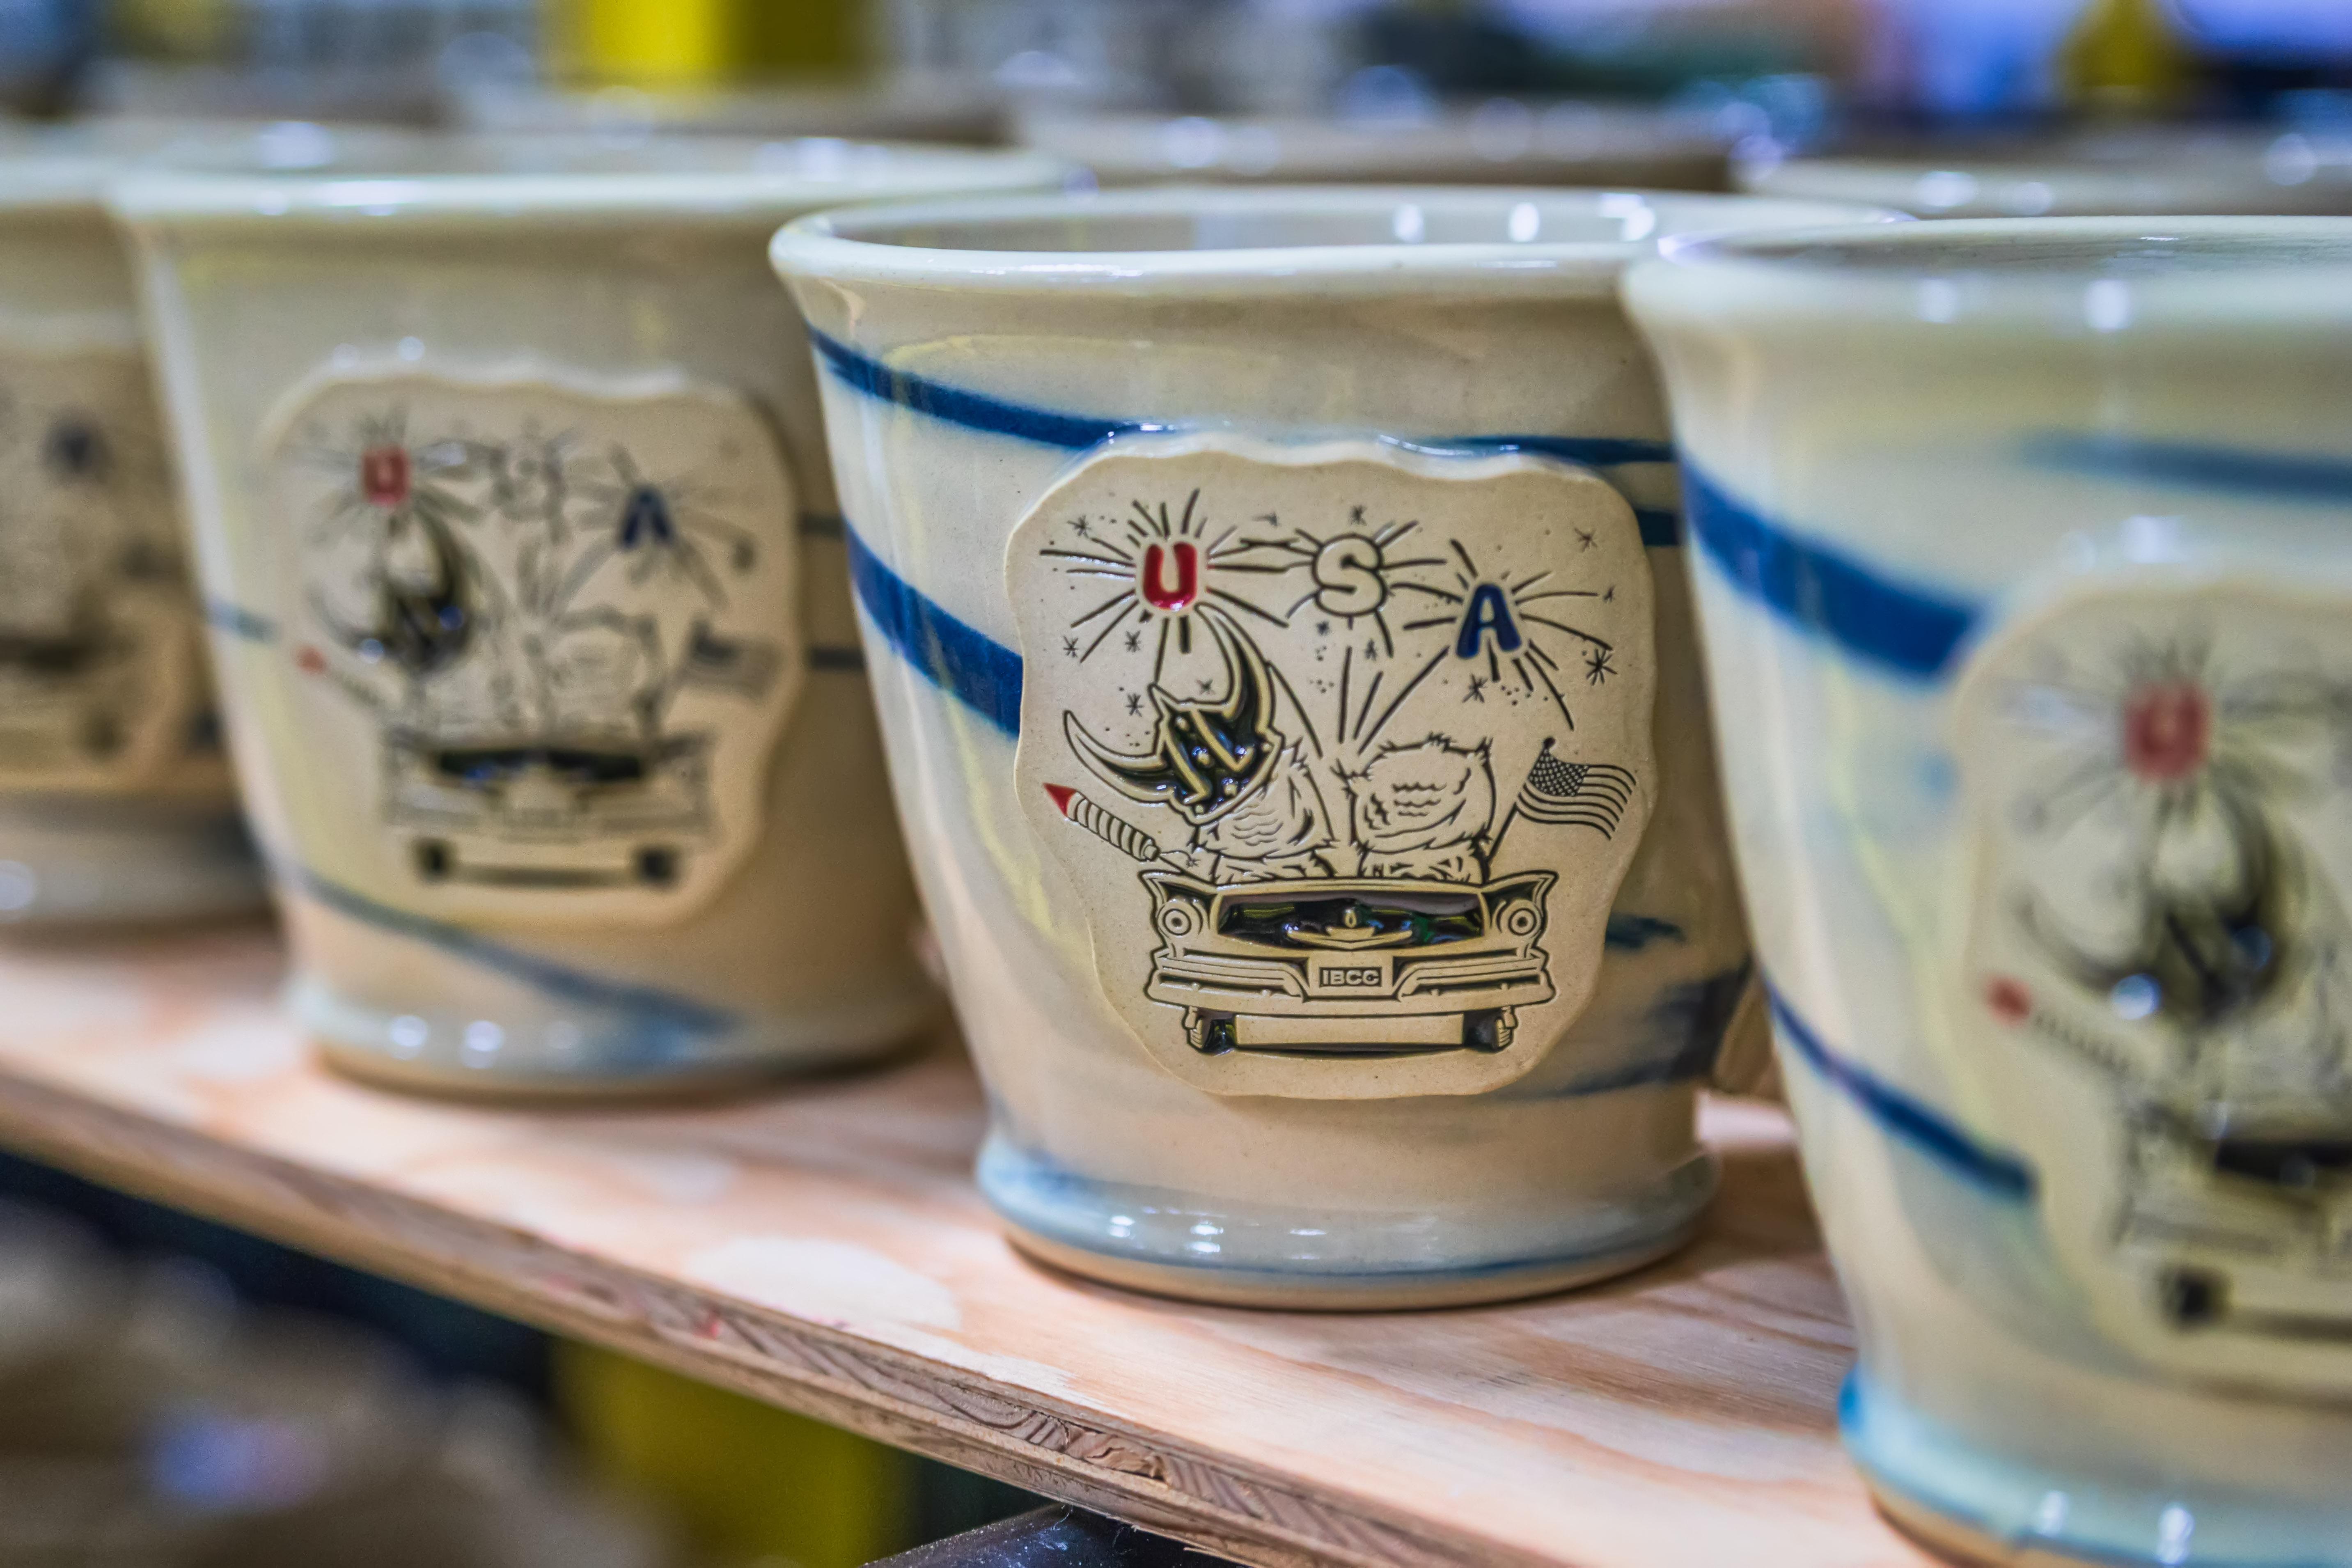 Stoneware mug with new developments from Iron Bean Coffee Company